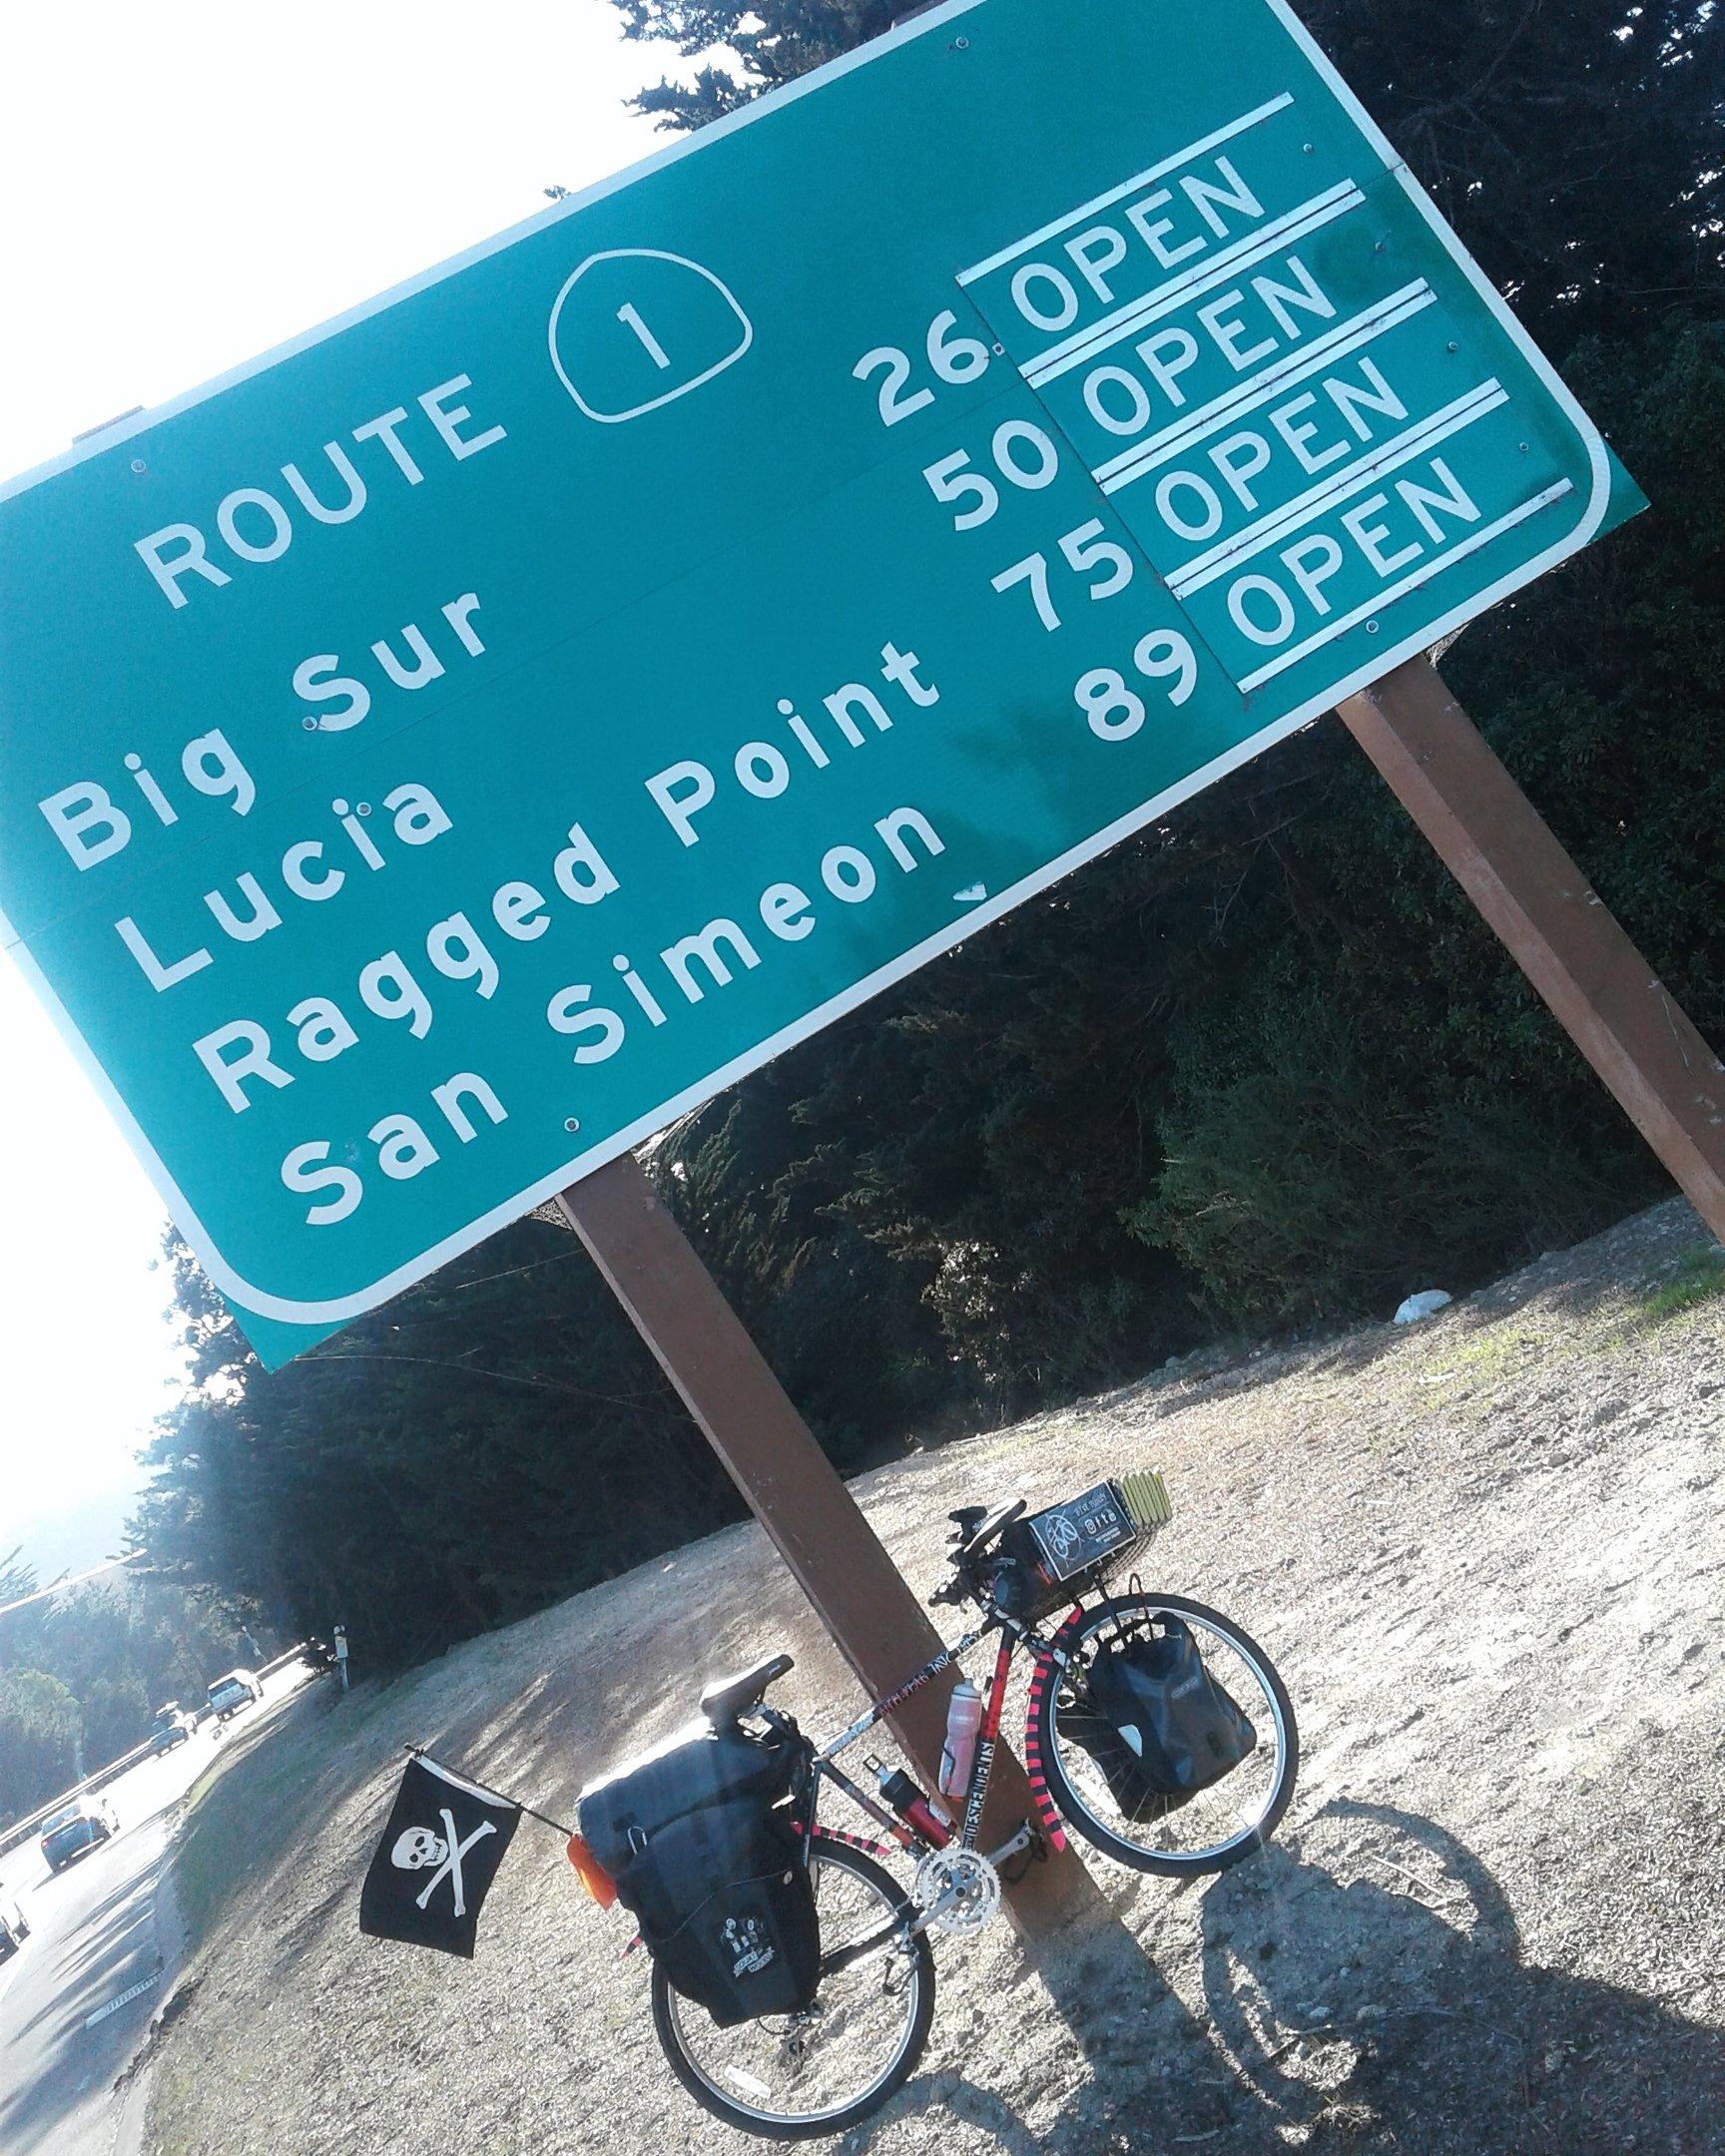 img_20181230_142944_742-jpg.48438_FIRST EVER BIKE TOUR (PICS)_Bike Touring_Squat the Planet_2:26 PM